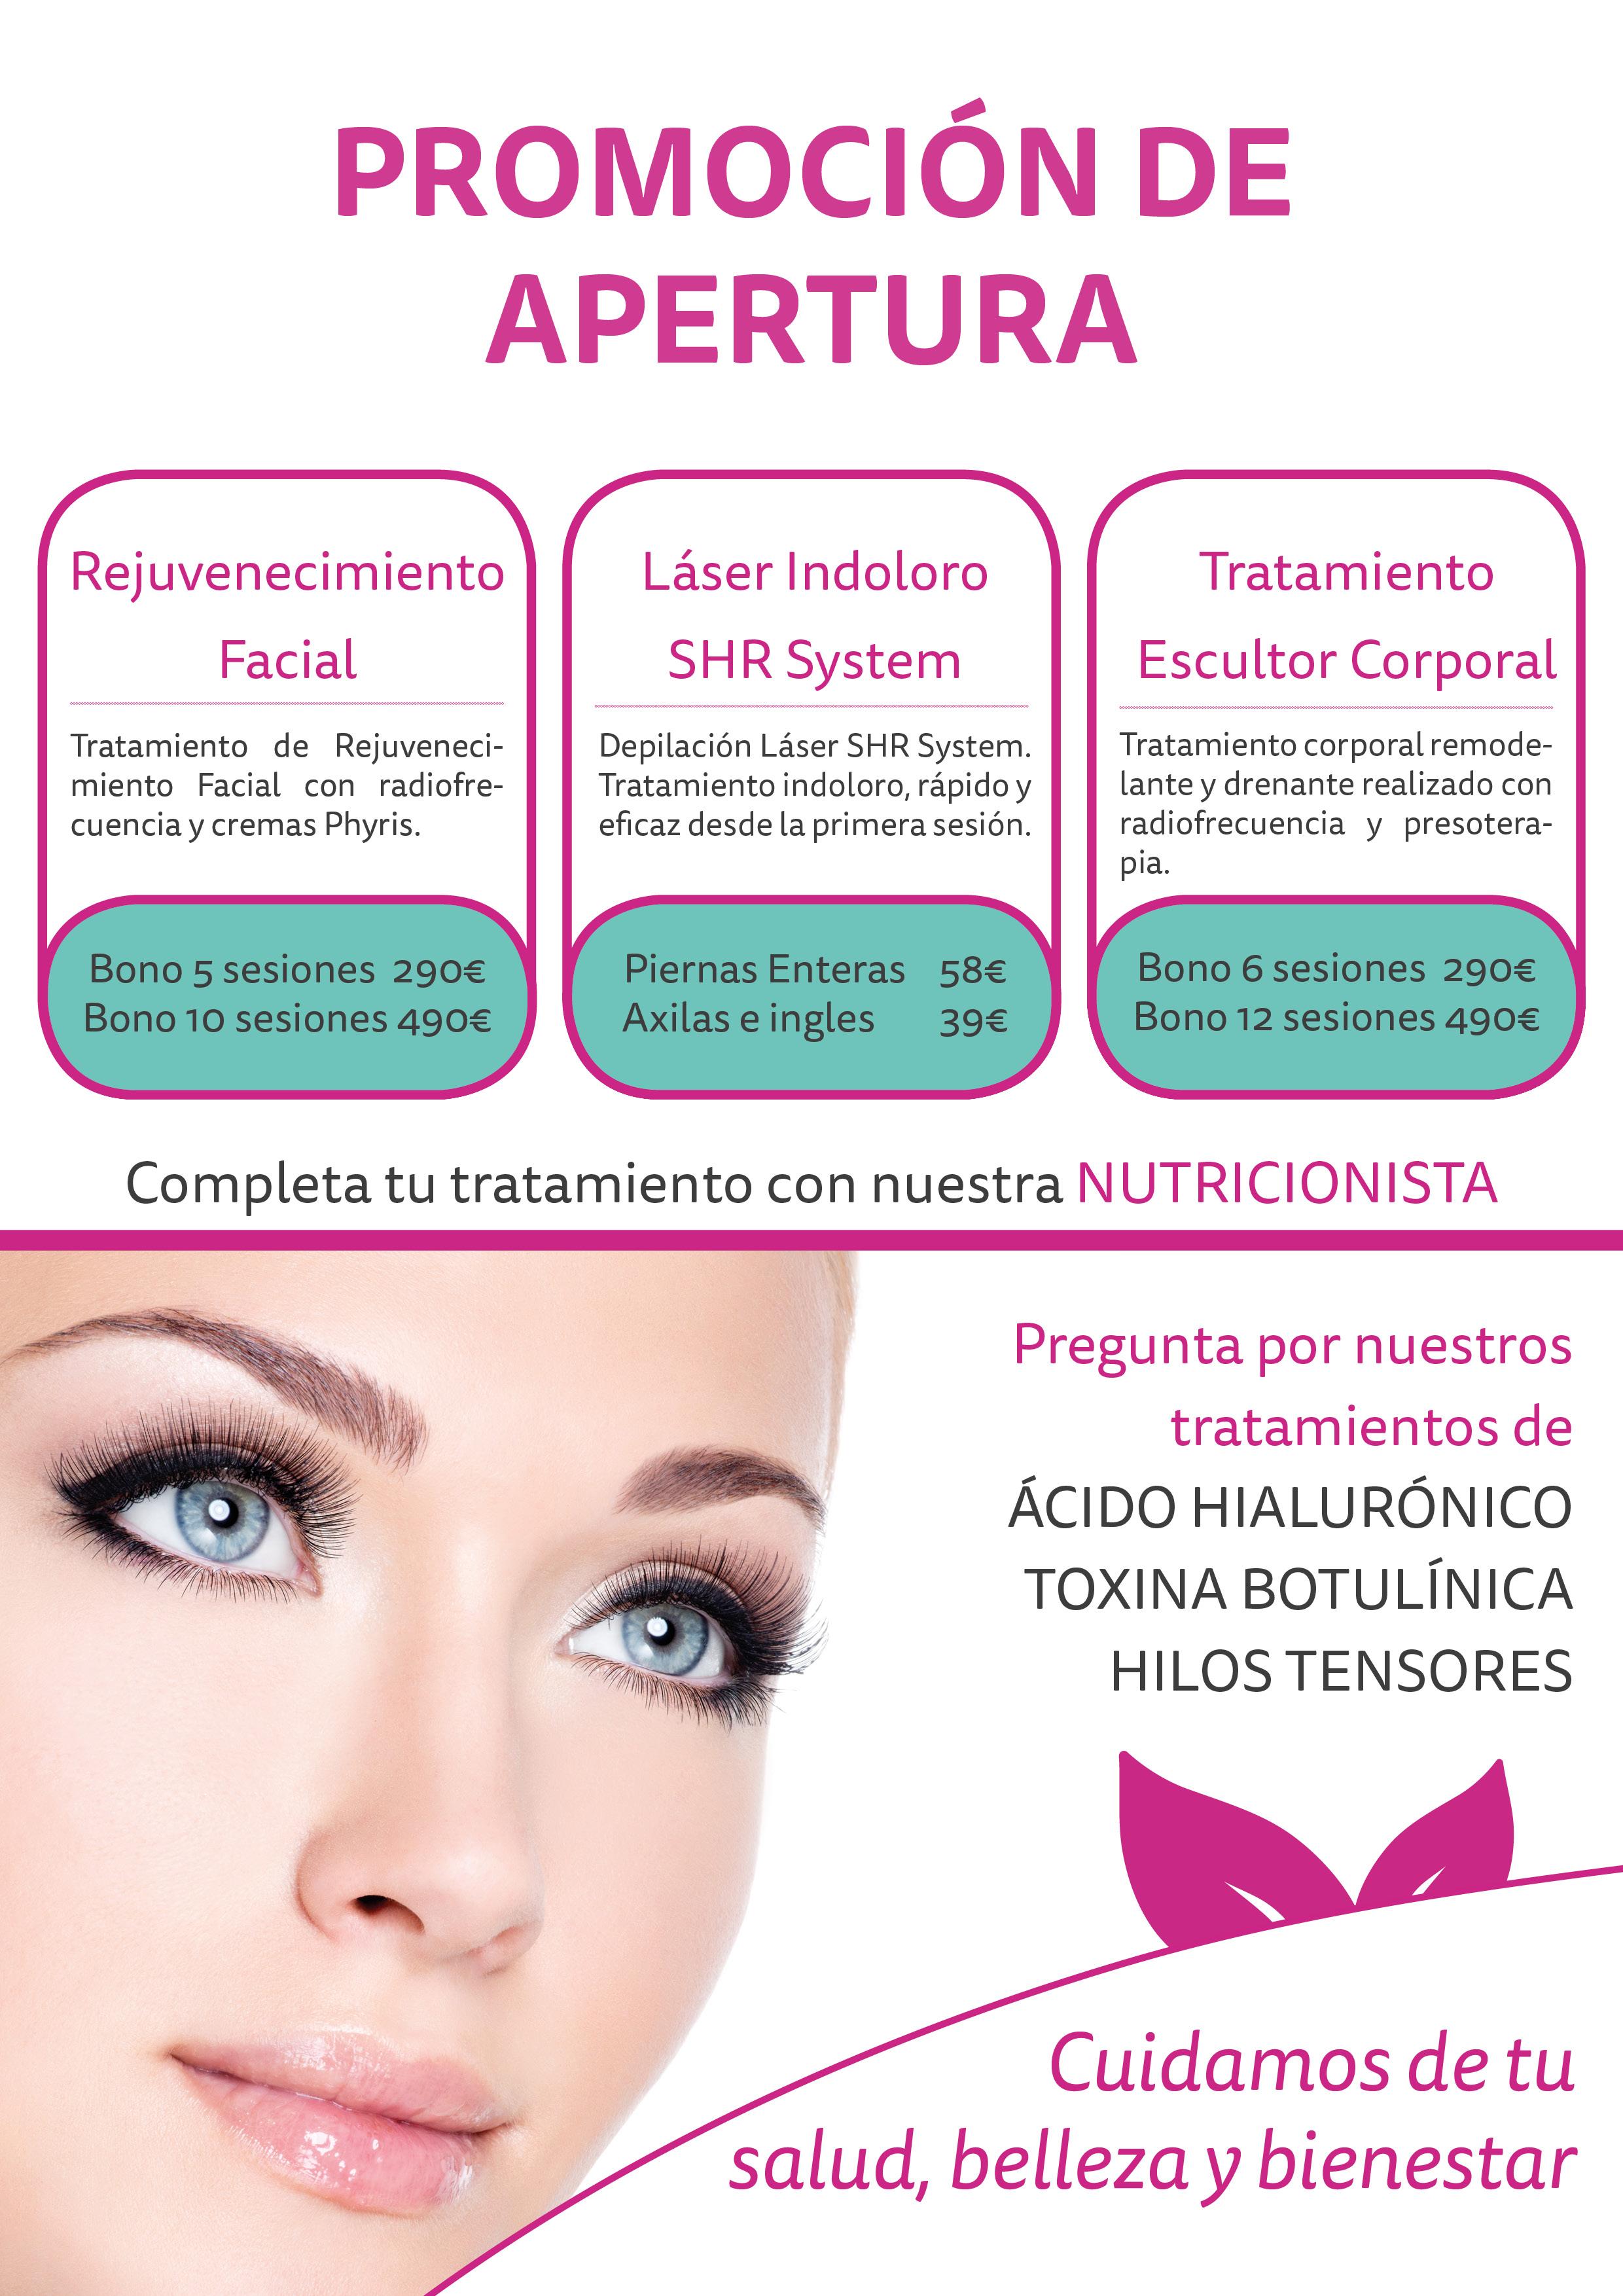 http://clinicabelestar.com/wp-content/uploads/2016/05/publi-fachada-mayo-estetica.jpg